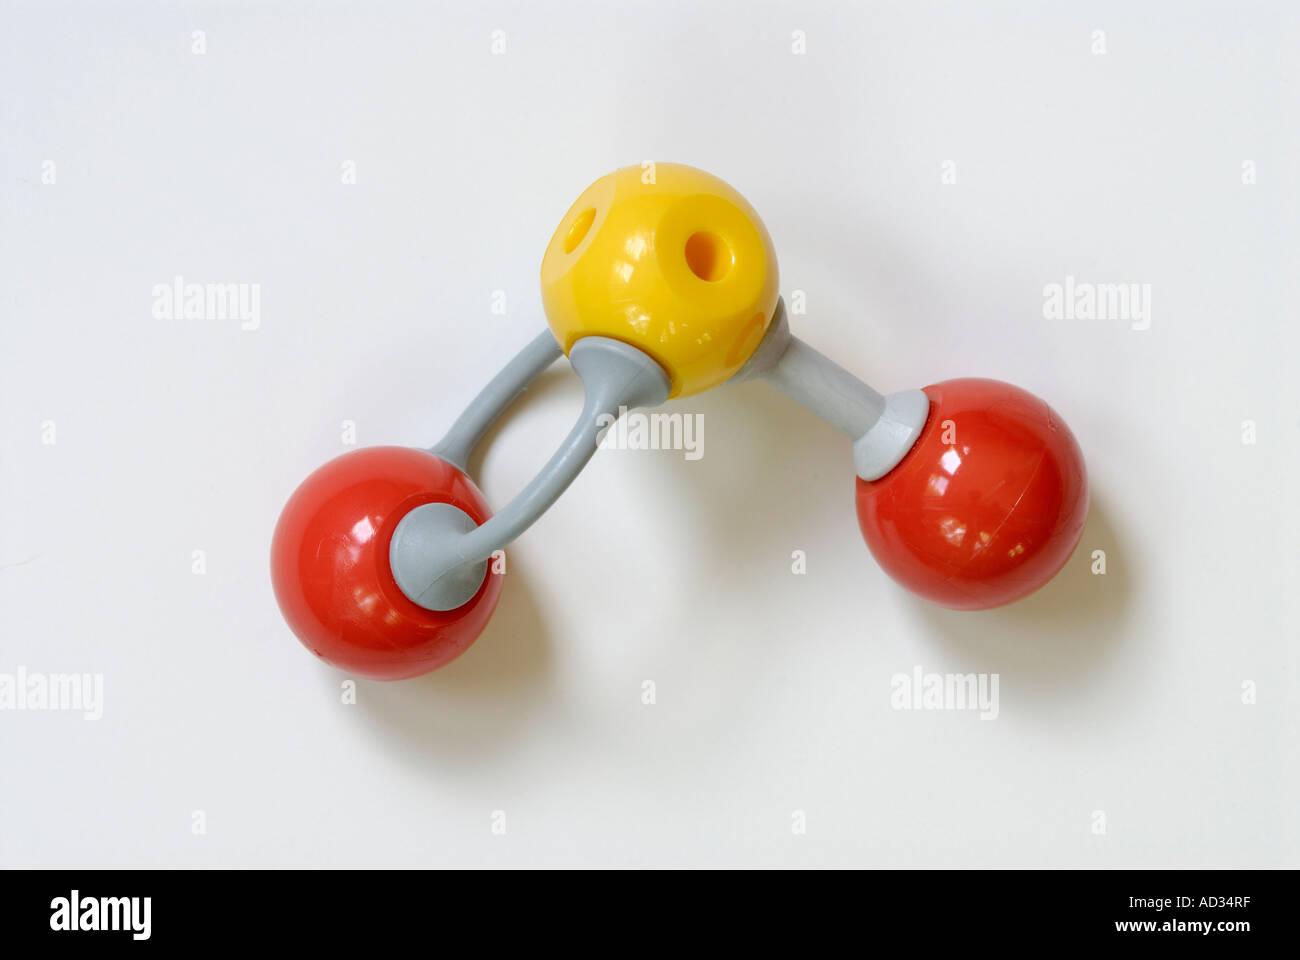 Sulfur dioxide molecular model - Stock Image